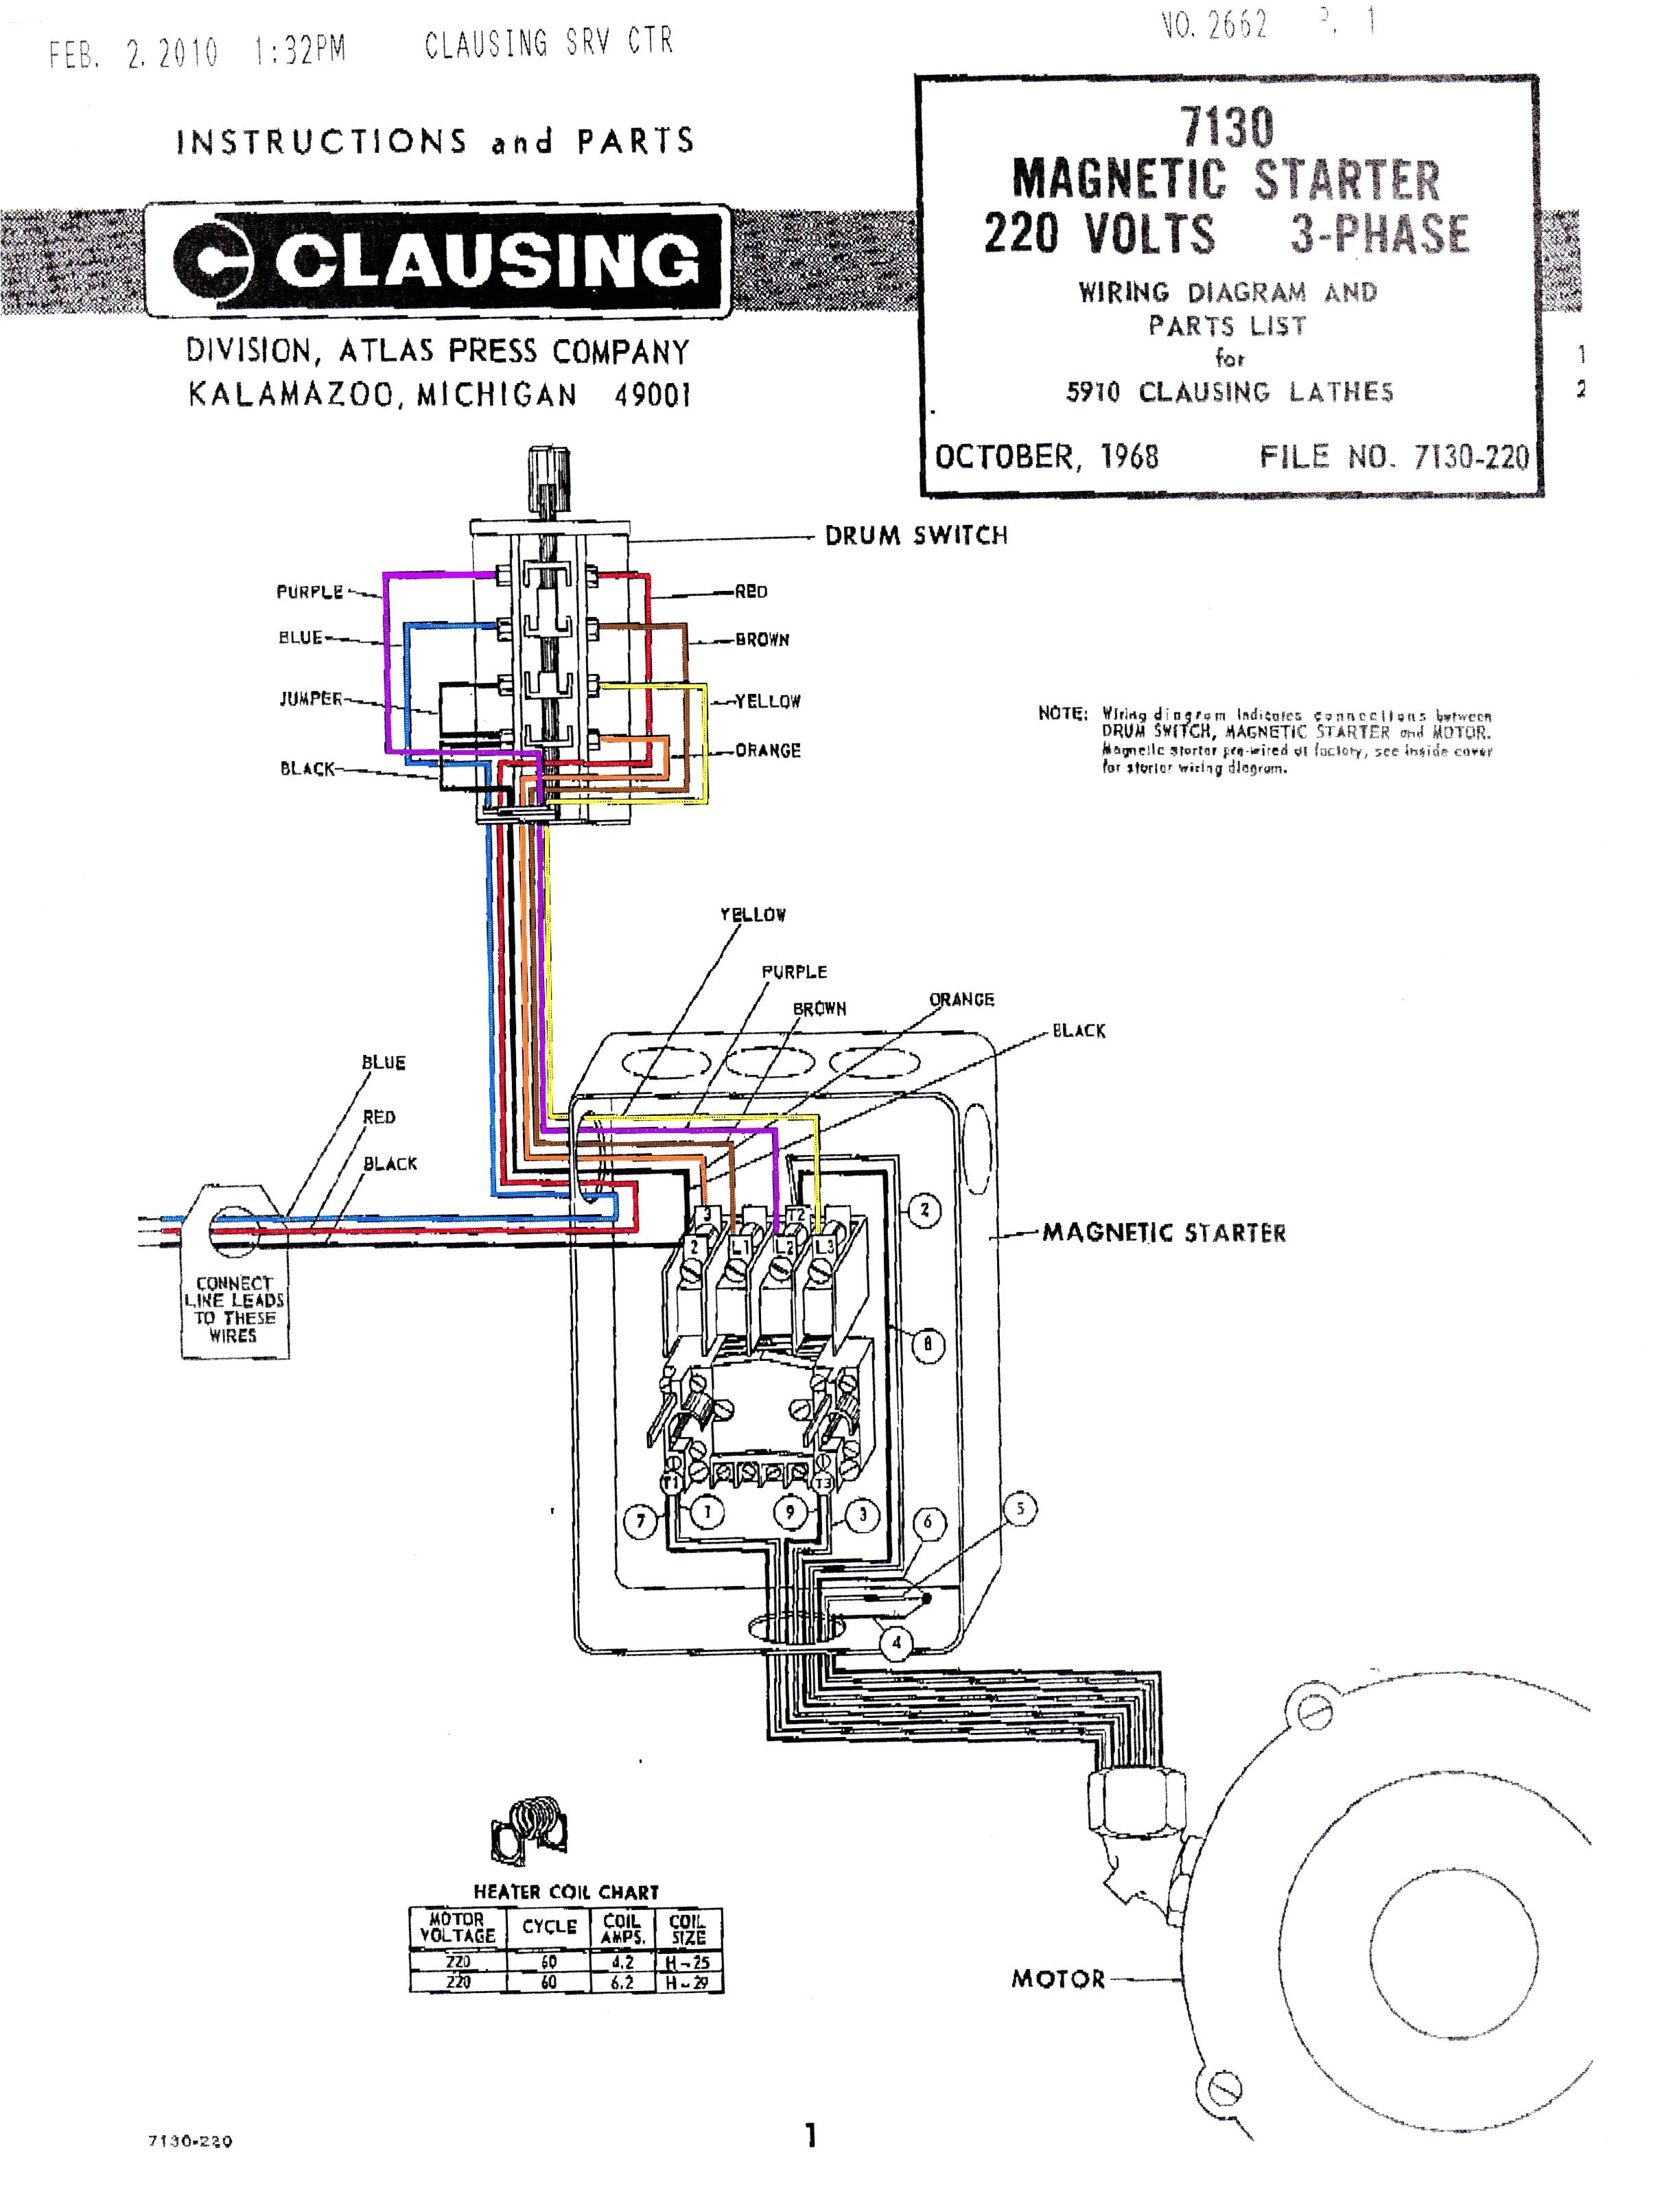 220 Wiring Diagram Cutler Hammer Wiring Diagrams Wiring Diagram Centre